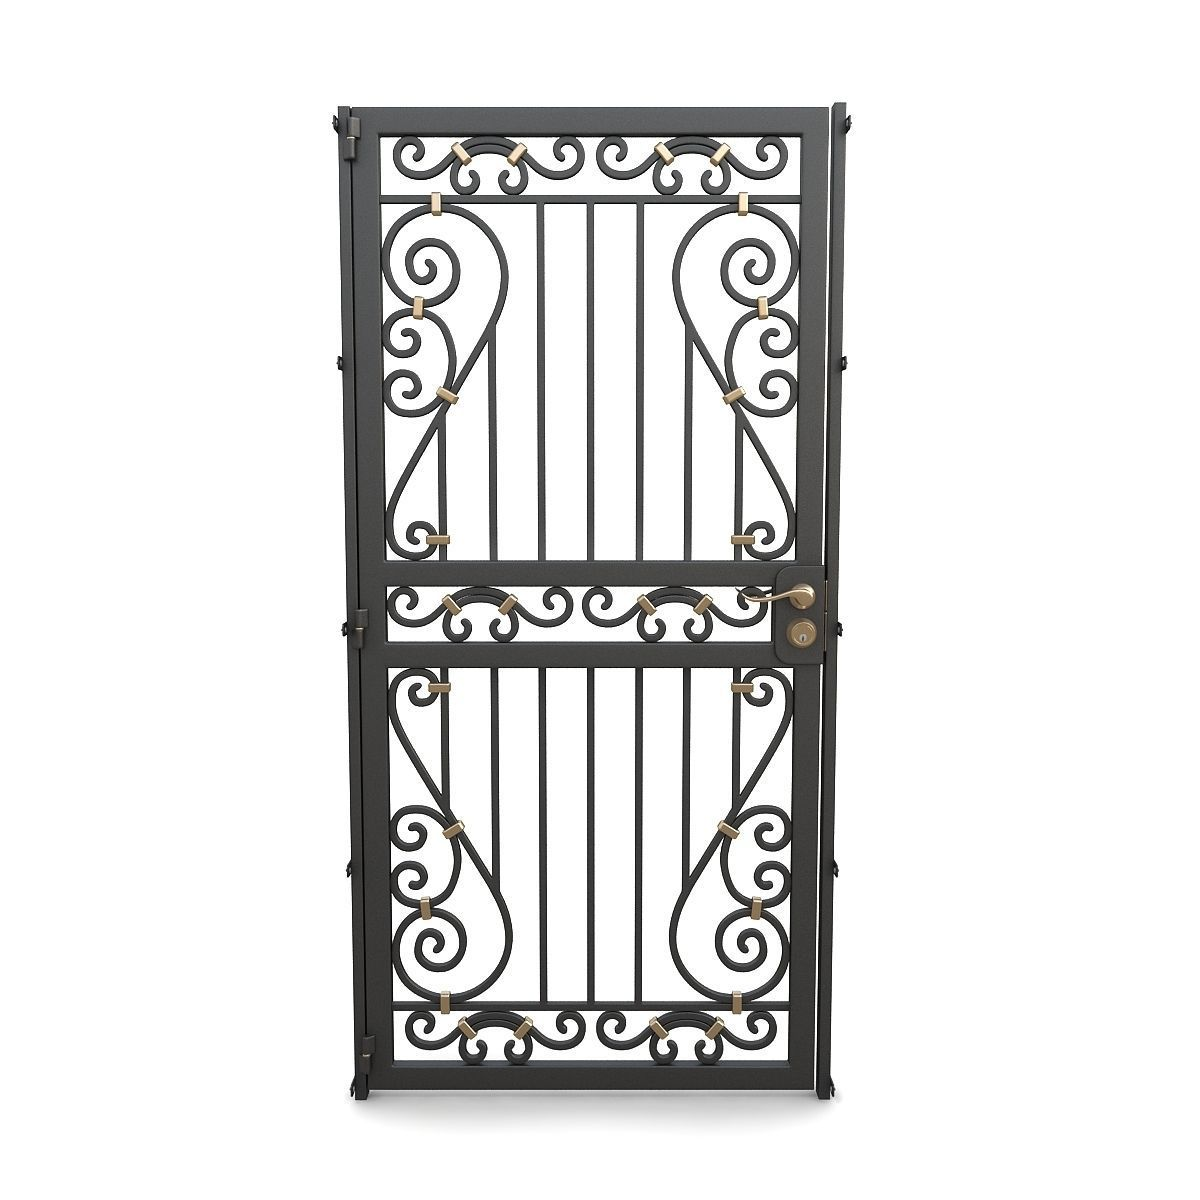 Wrought iron gate 11